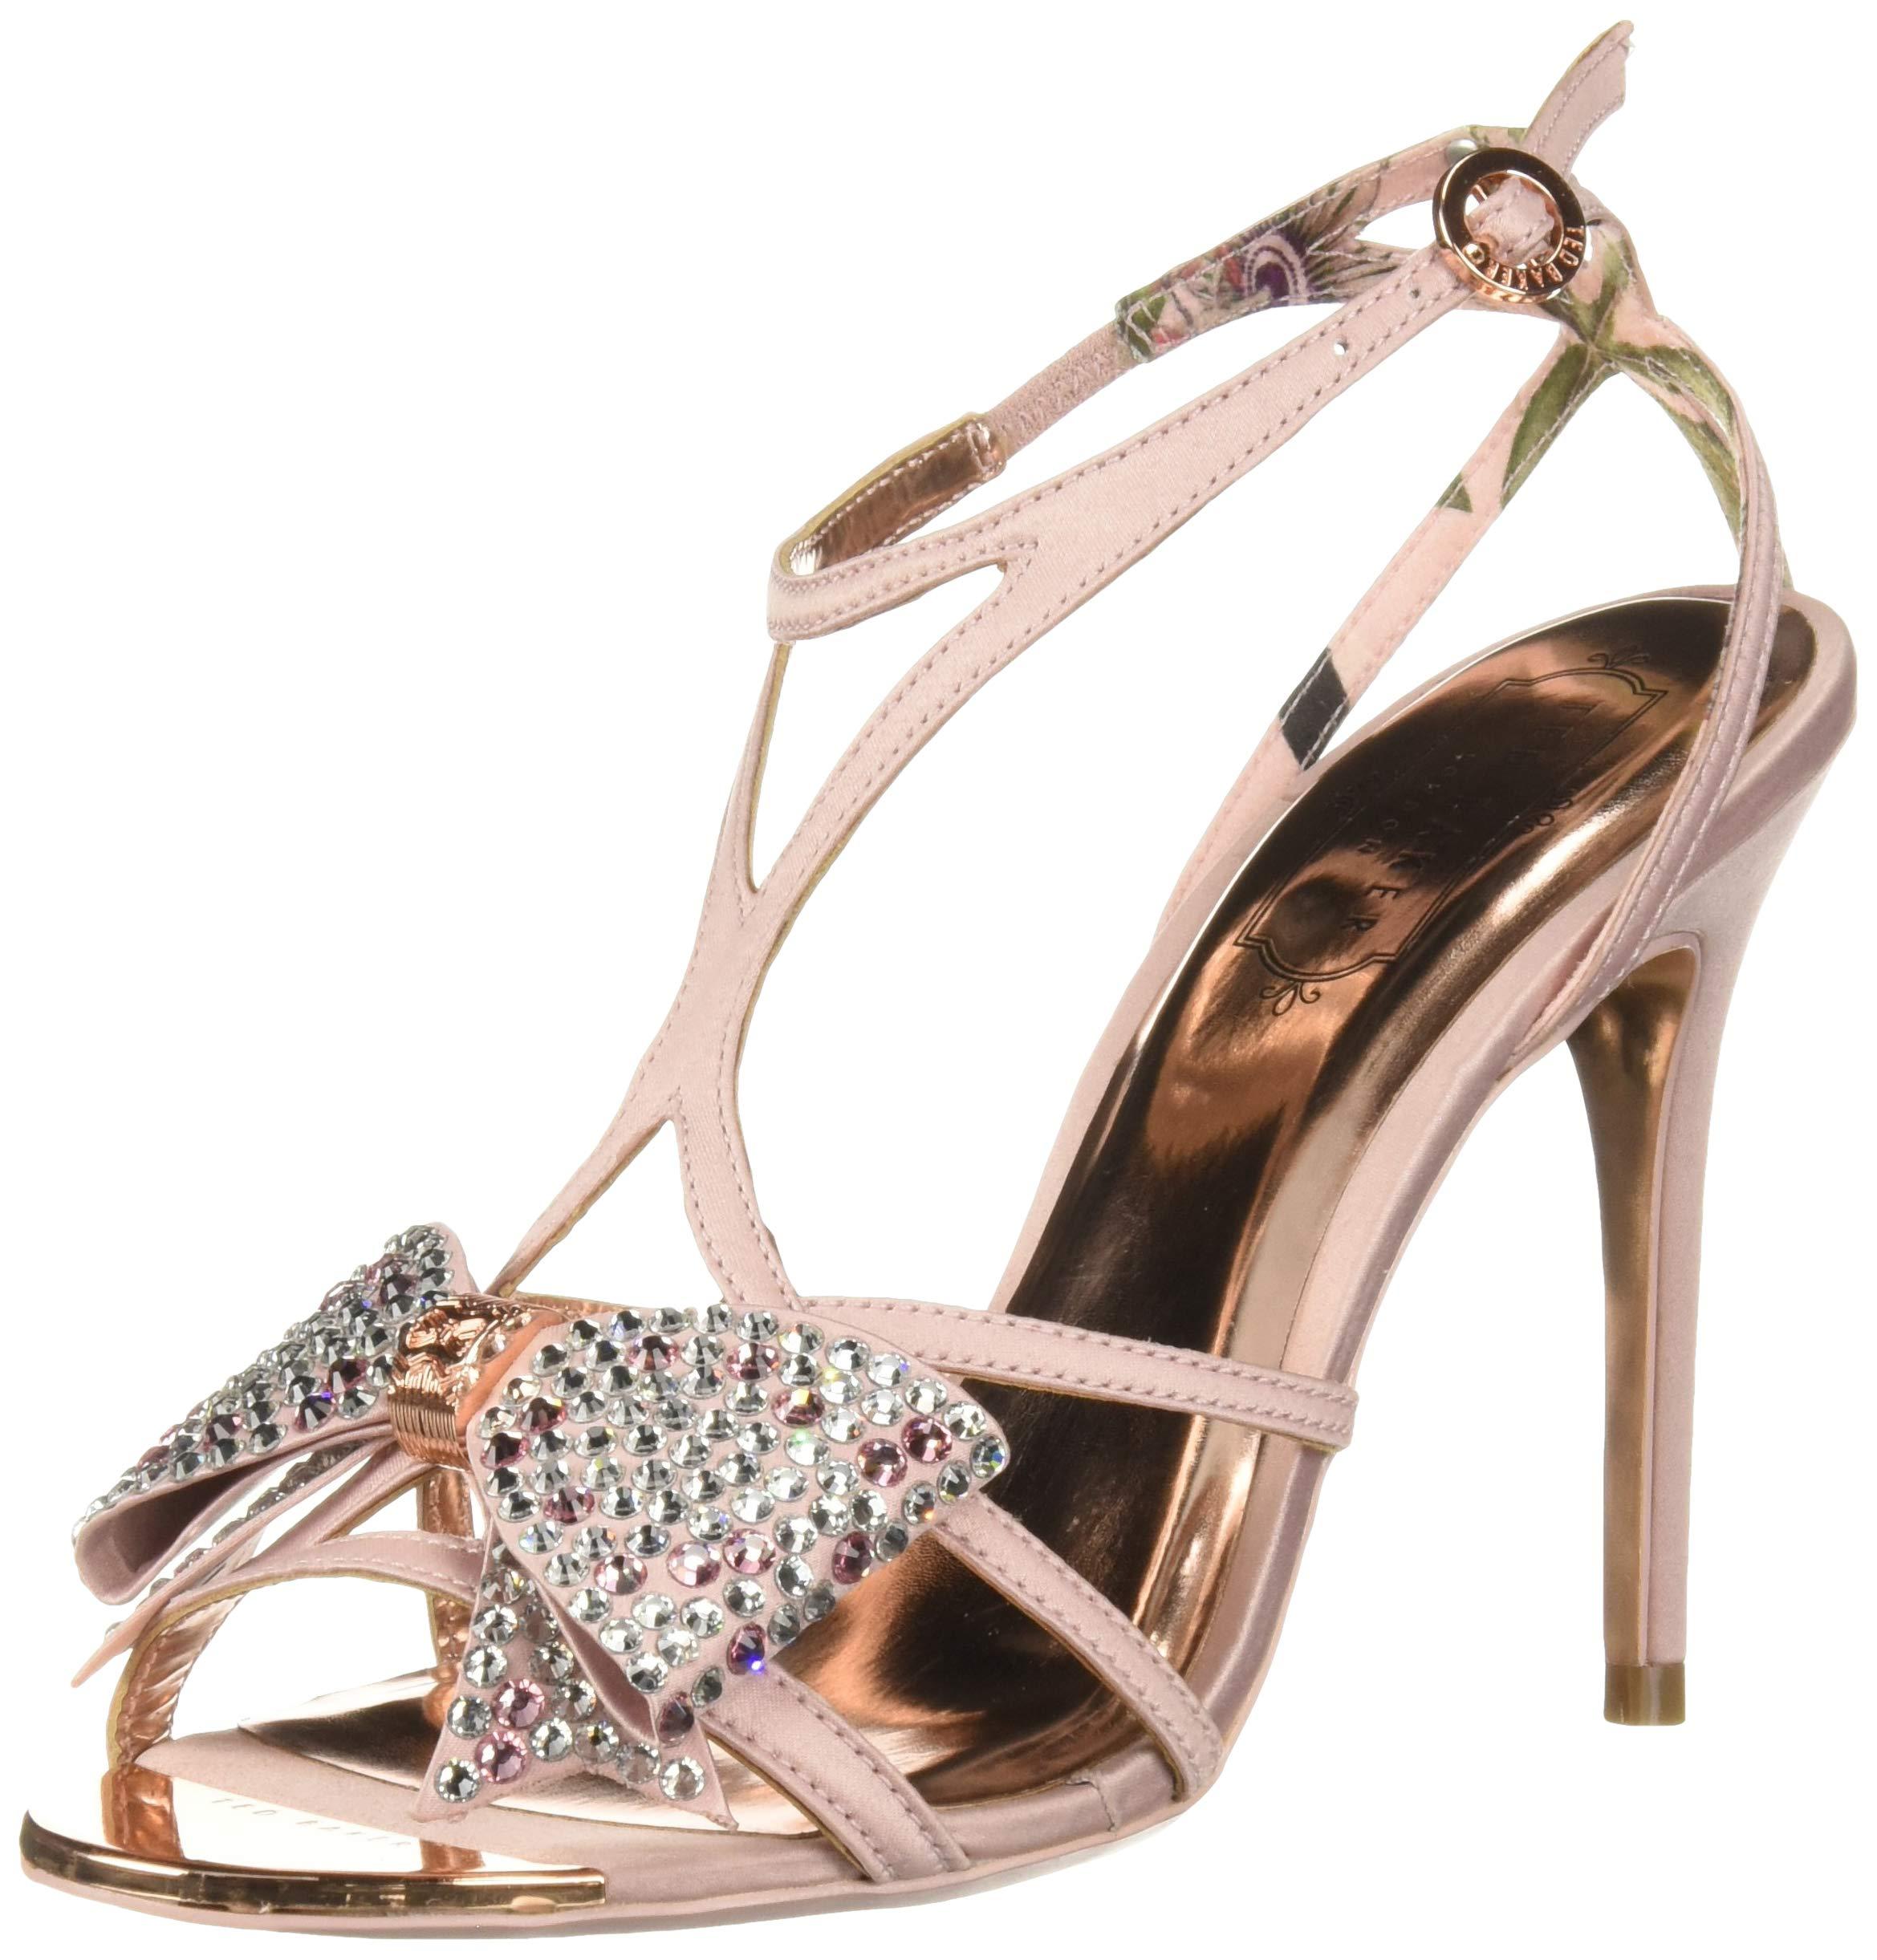 Ted Baker Women's Arayi Heeled Sandal, Pink Blossom, 6.5 Regular US by Ted Baker